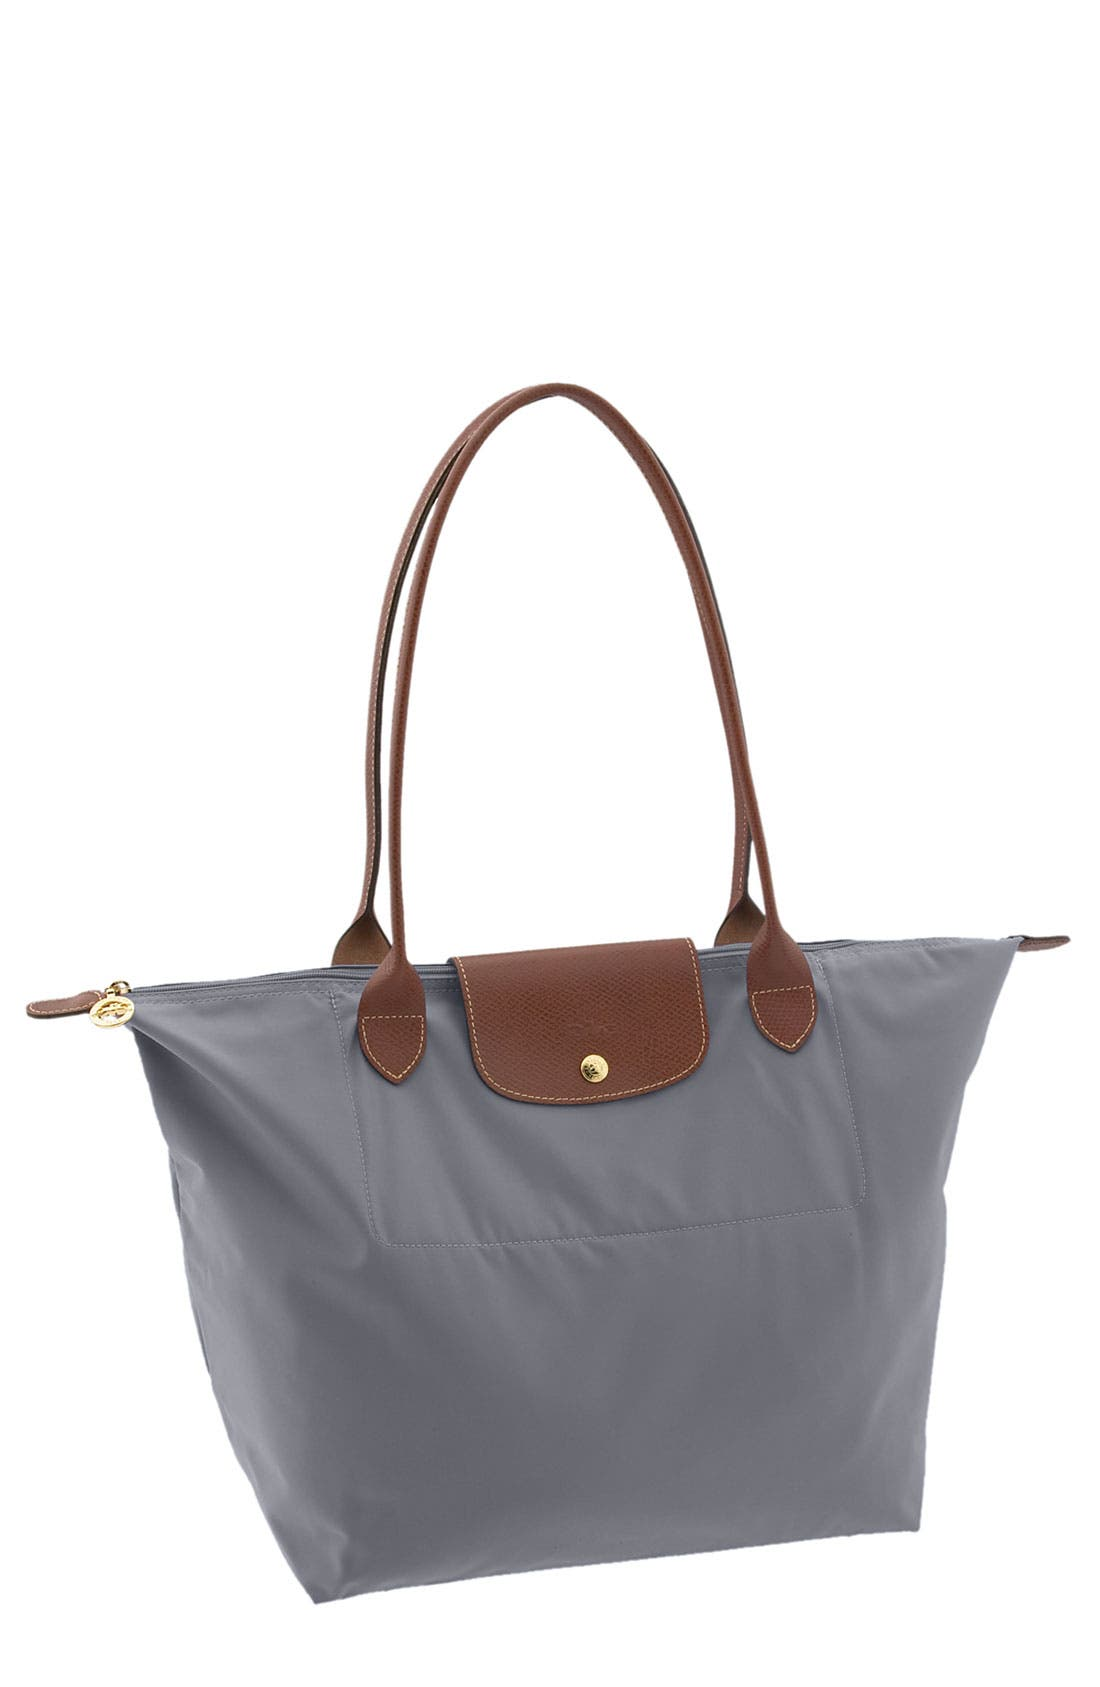 'Le Pliage - Large' Tote Bag,                             Main thumbnail 1, color,                             020